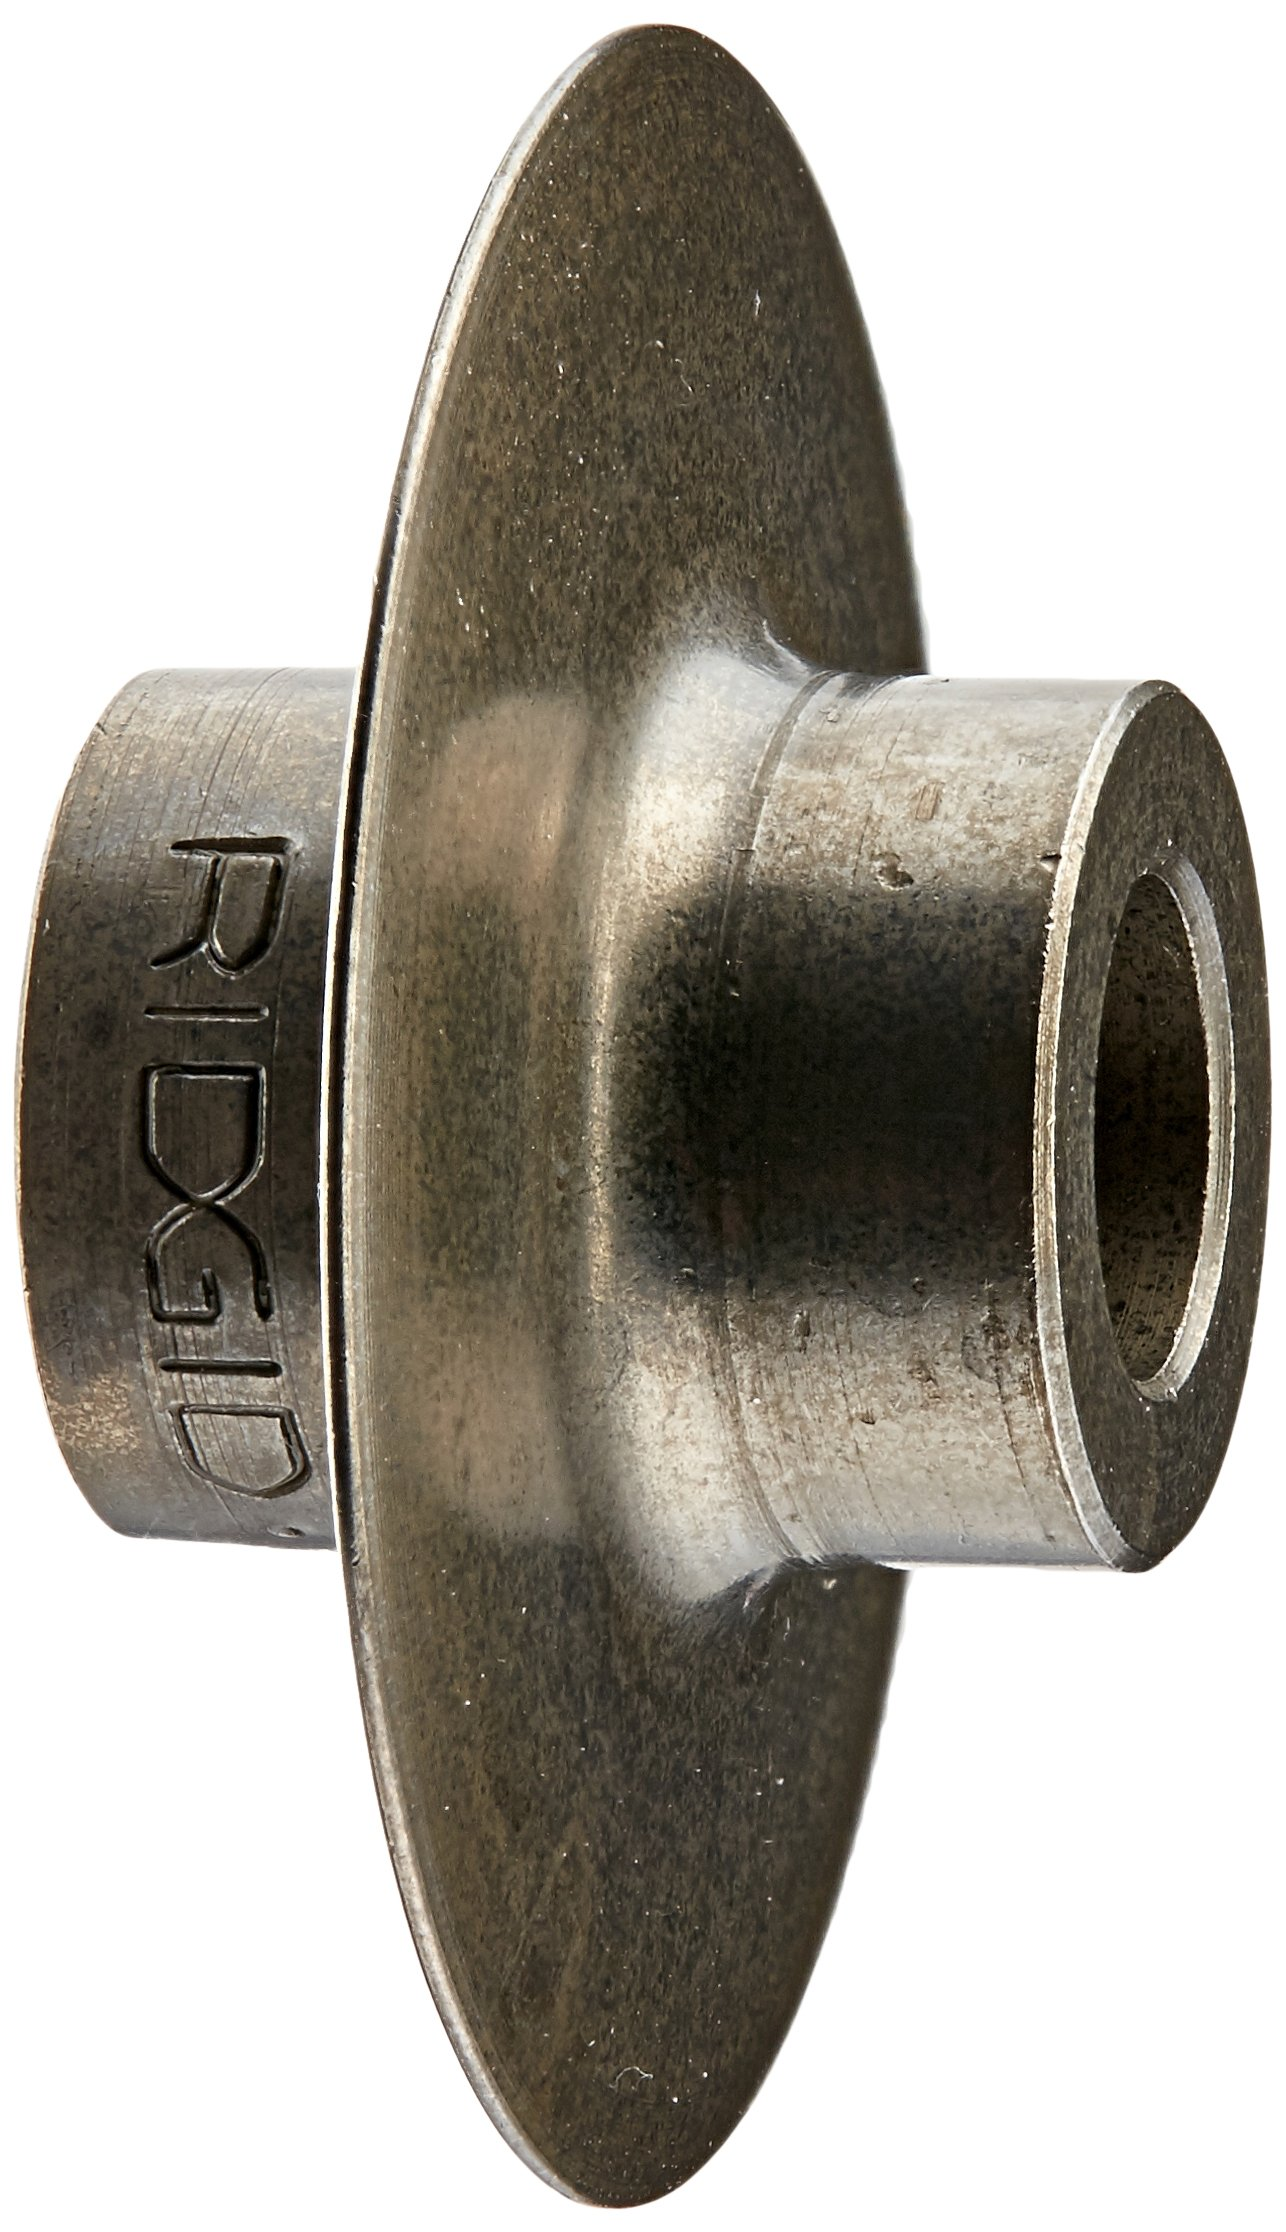 Ridgid 44185 Pipe Cutter Replacement Wheel